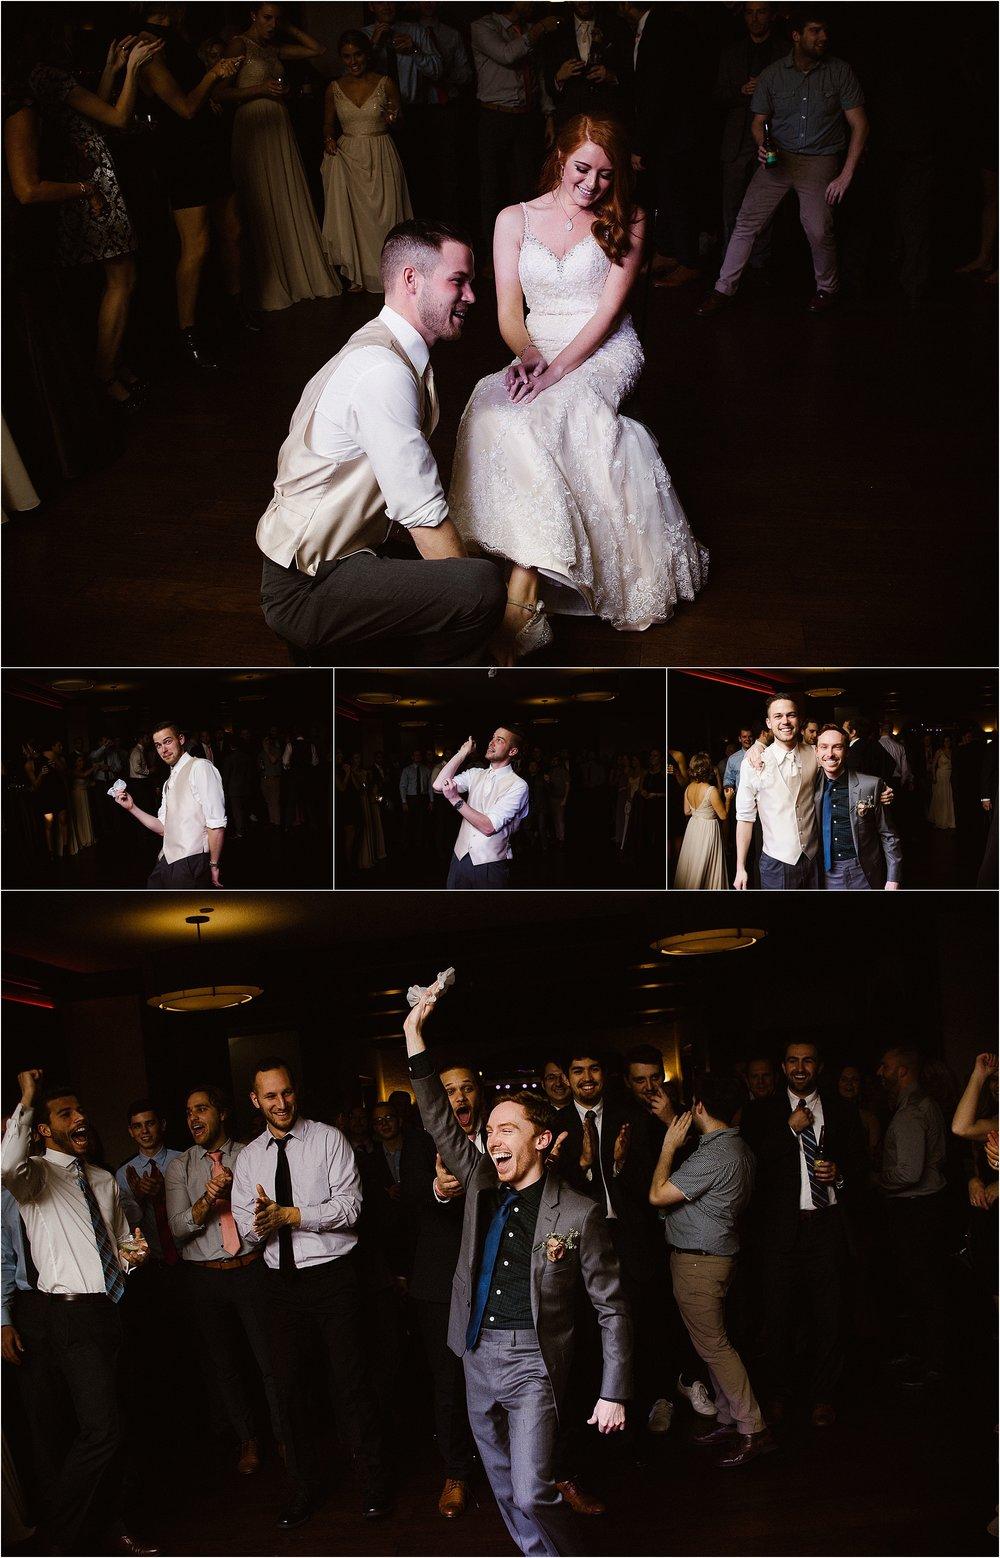 elegant-wedding-empyrean-events-catering-fort-wayne-indiana-photographer-86